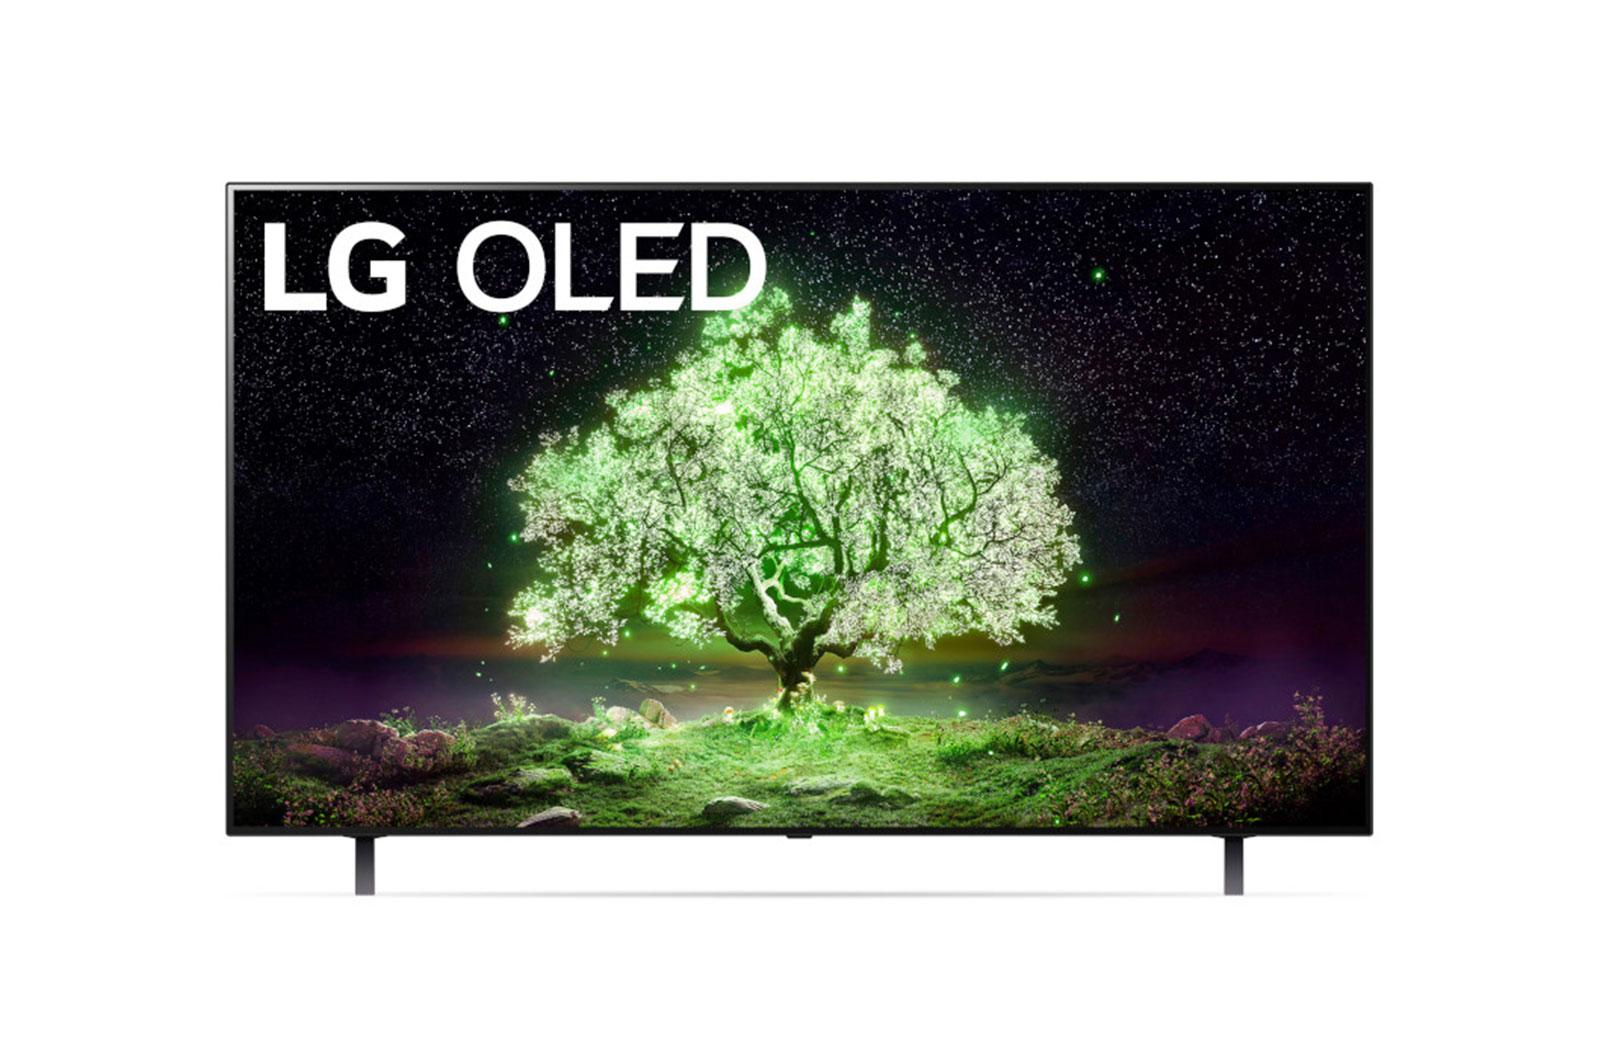 LG A1 55 inch Class 4K Smart OLED TV w/ ThinQ AI® (54.6'' Diag)